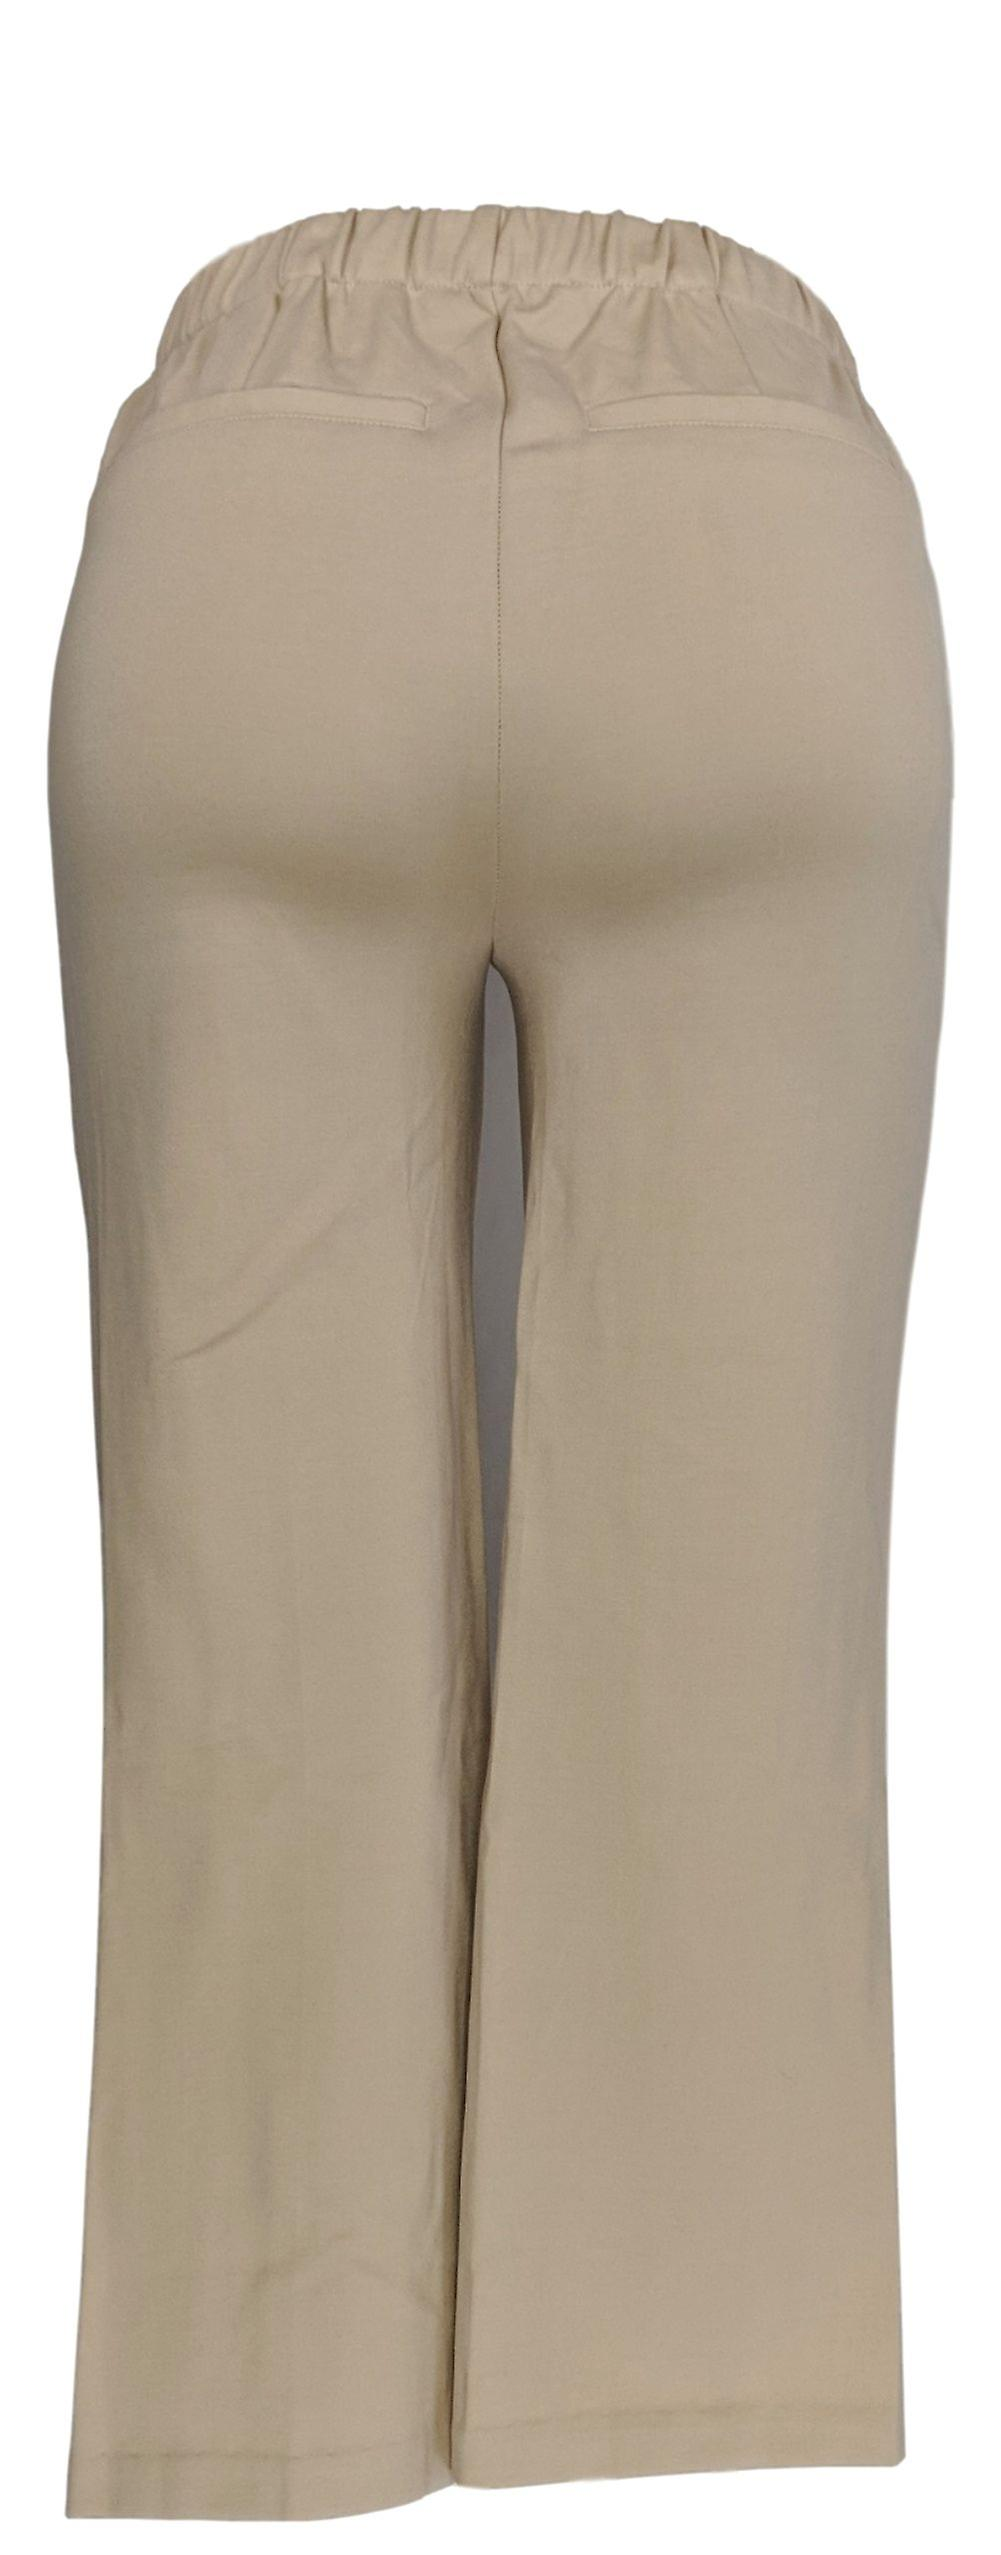 H by Halston Women's Pants Ponte Knit Wide Leg Pull-On Crop Beige A272372 uUg3iZ